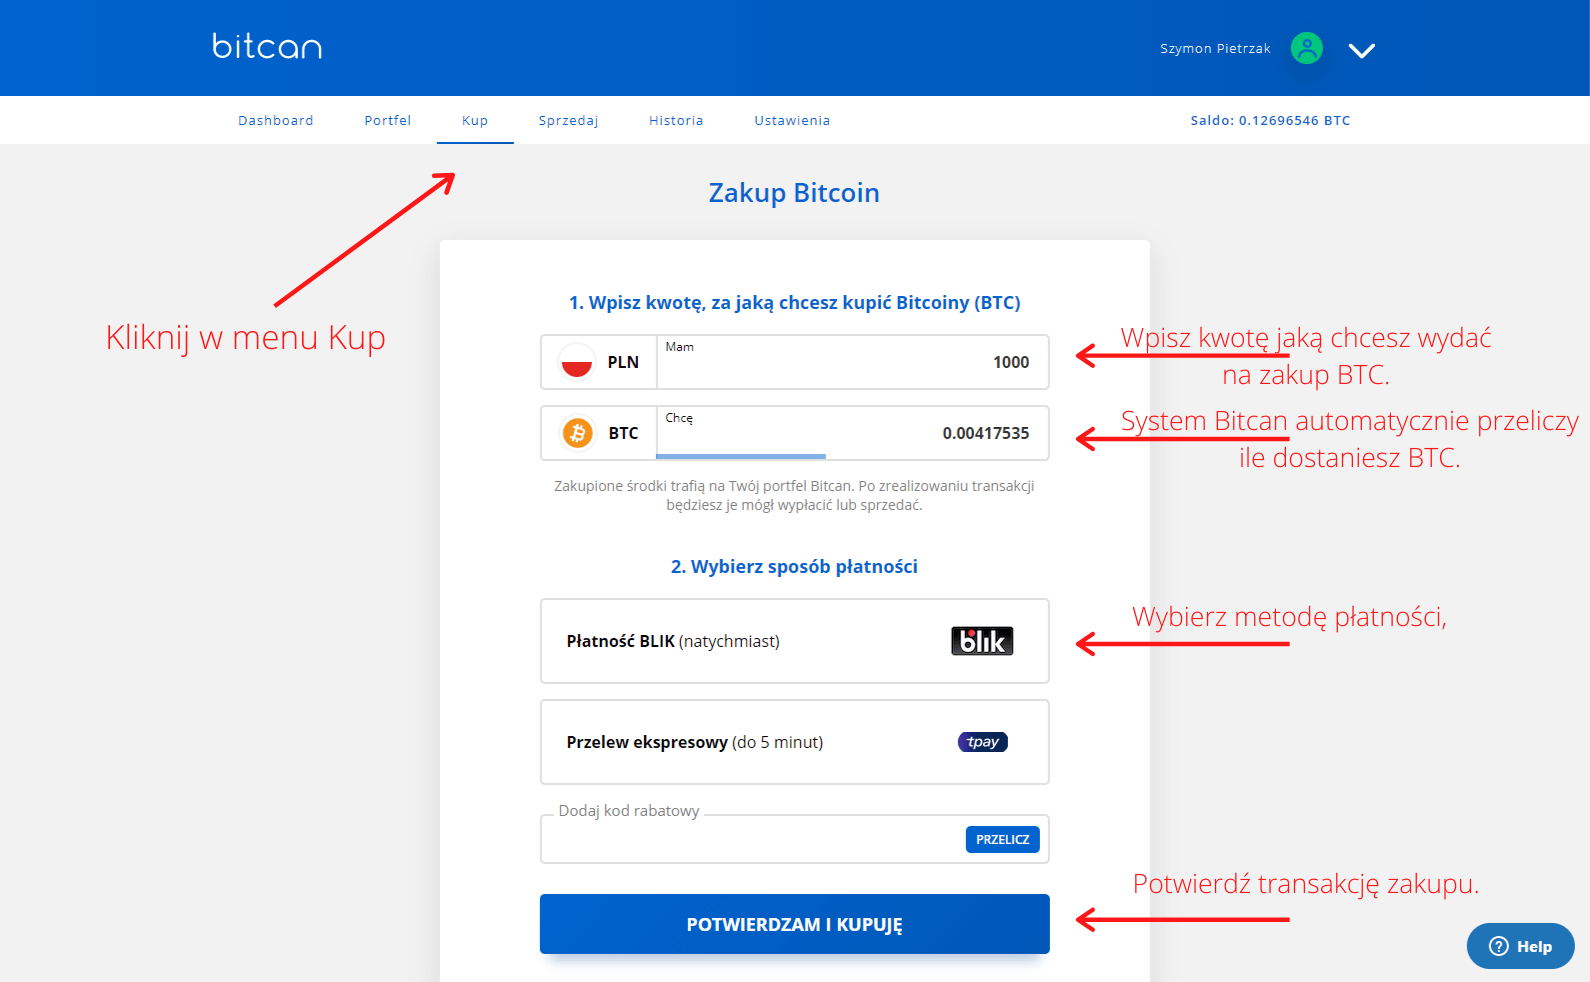 Zakup bitcoin w kantorze Bitcan